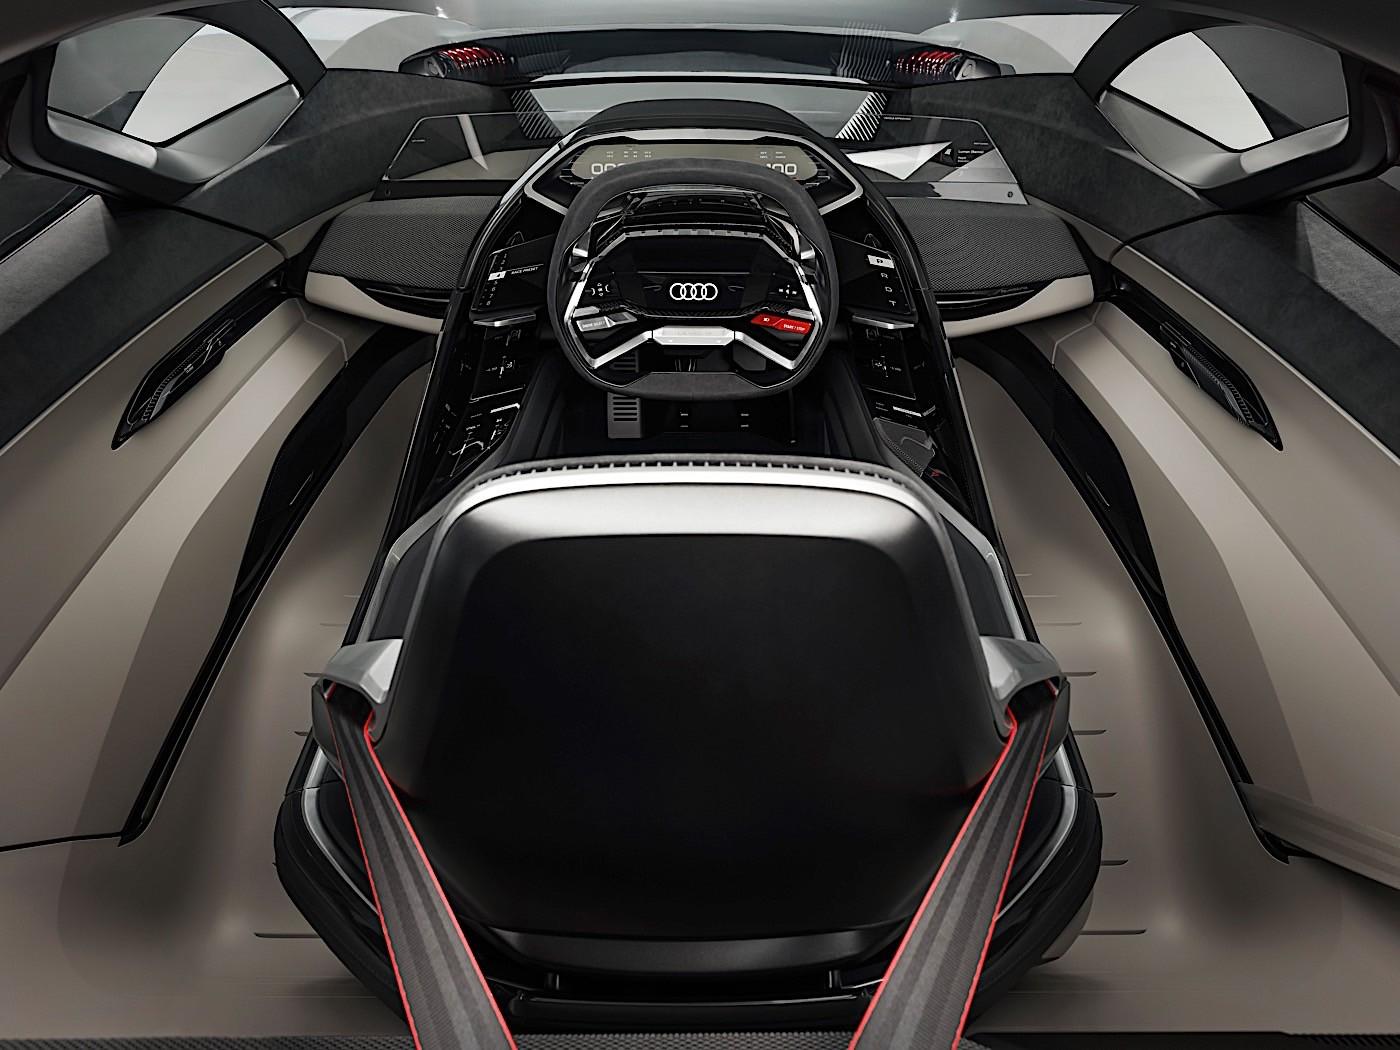 Audi PB18 e-tron Concept Car Is a Californian Nod to Le ...